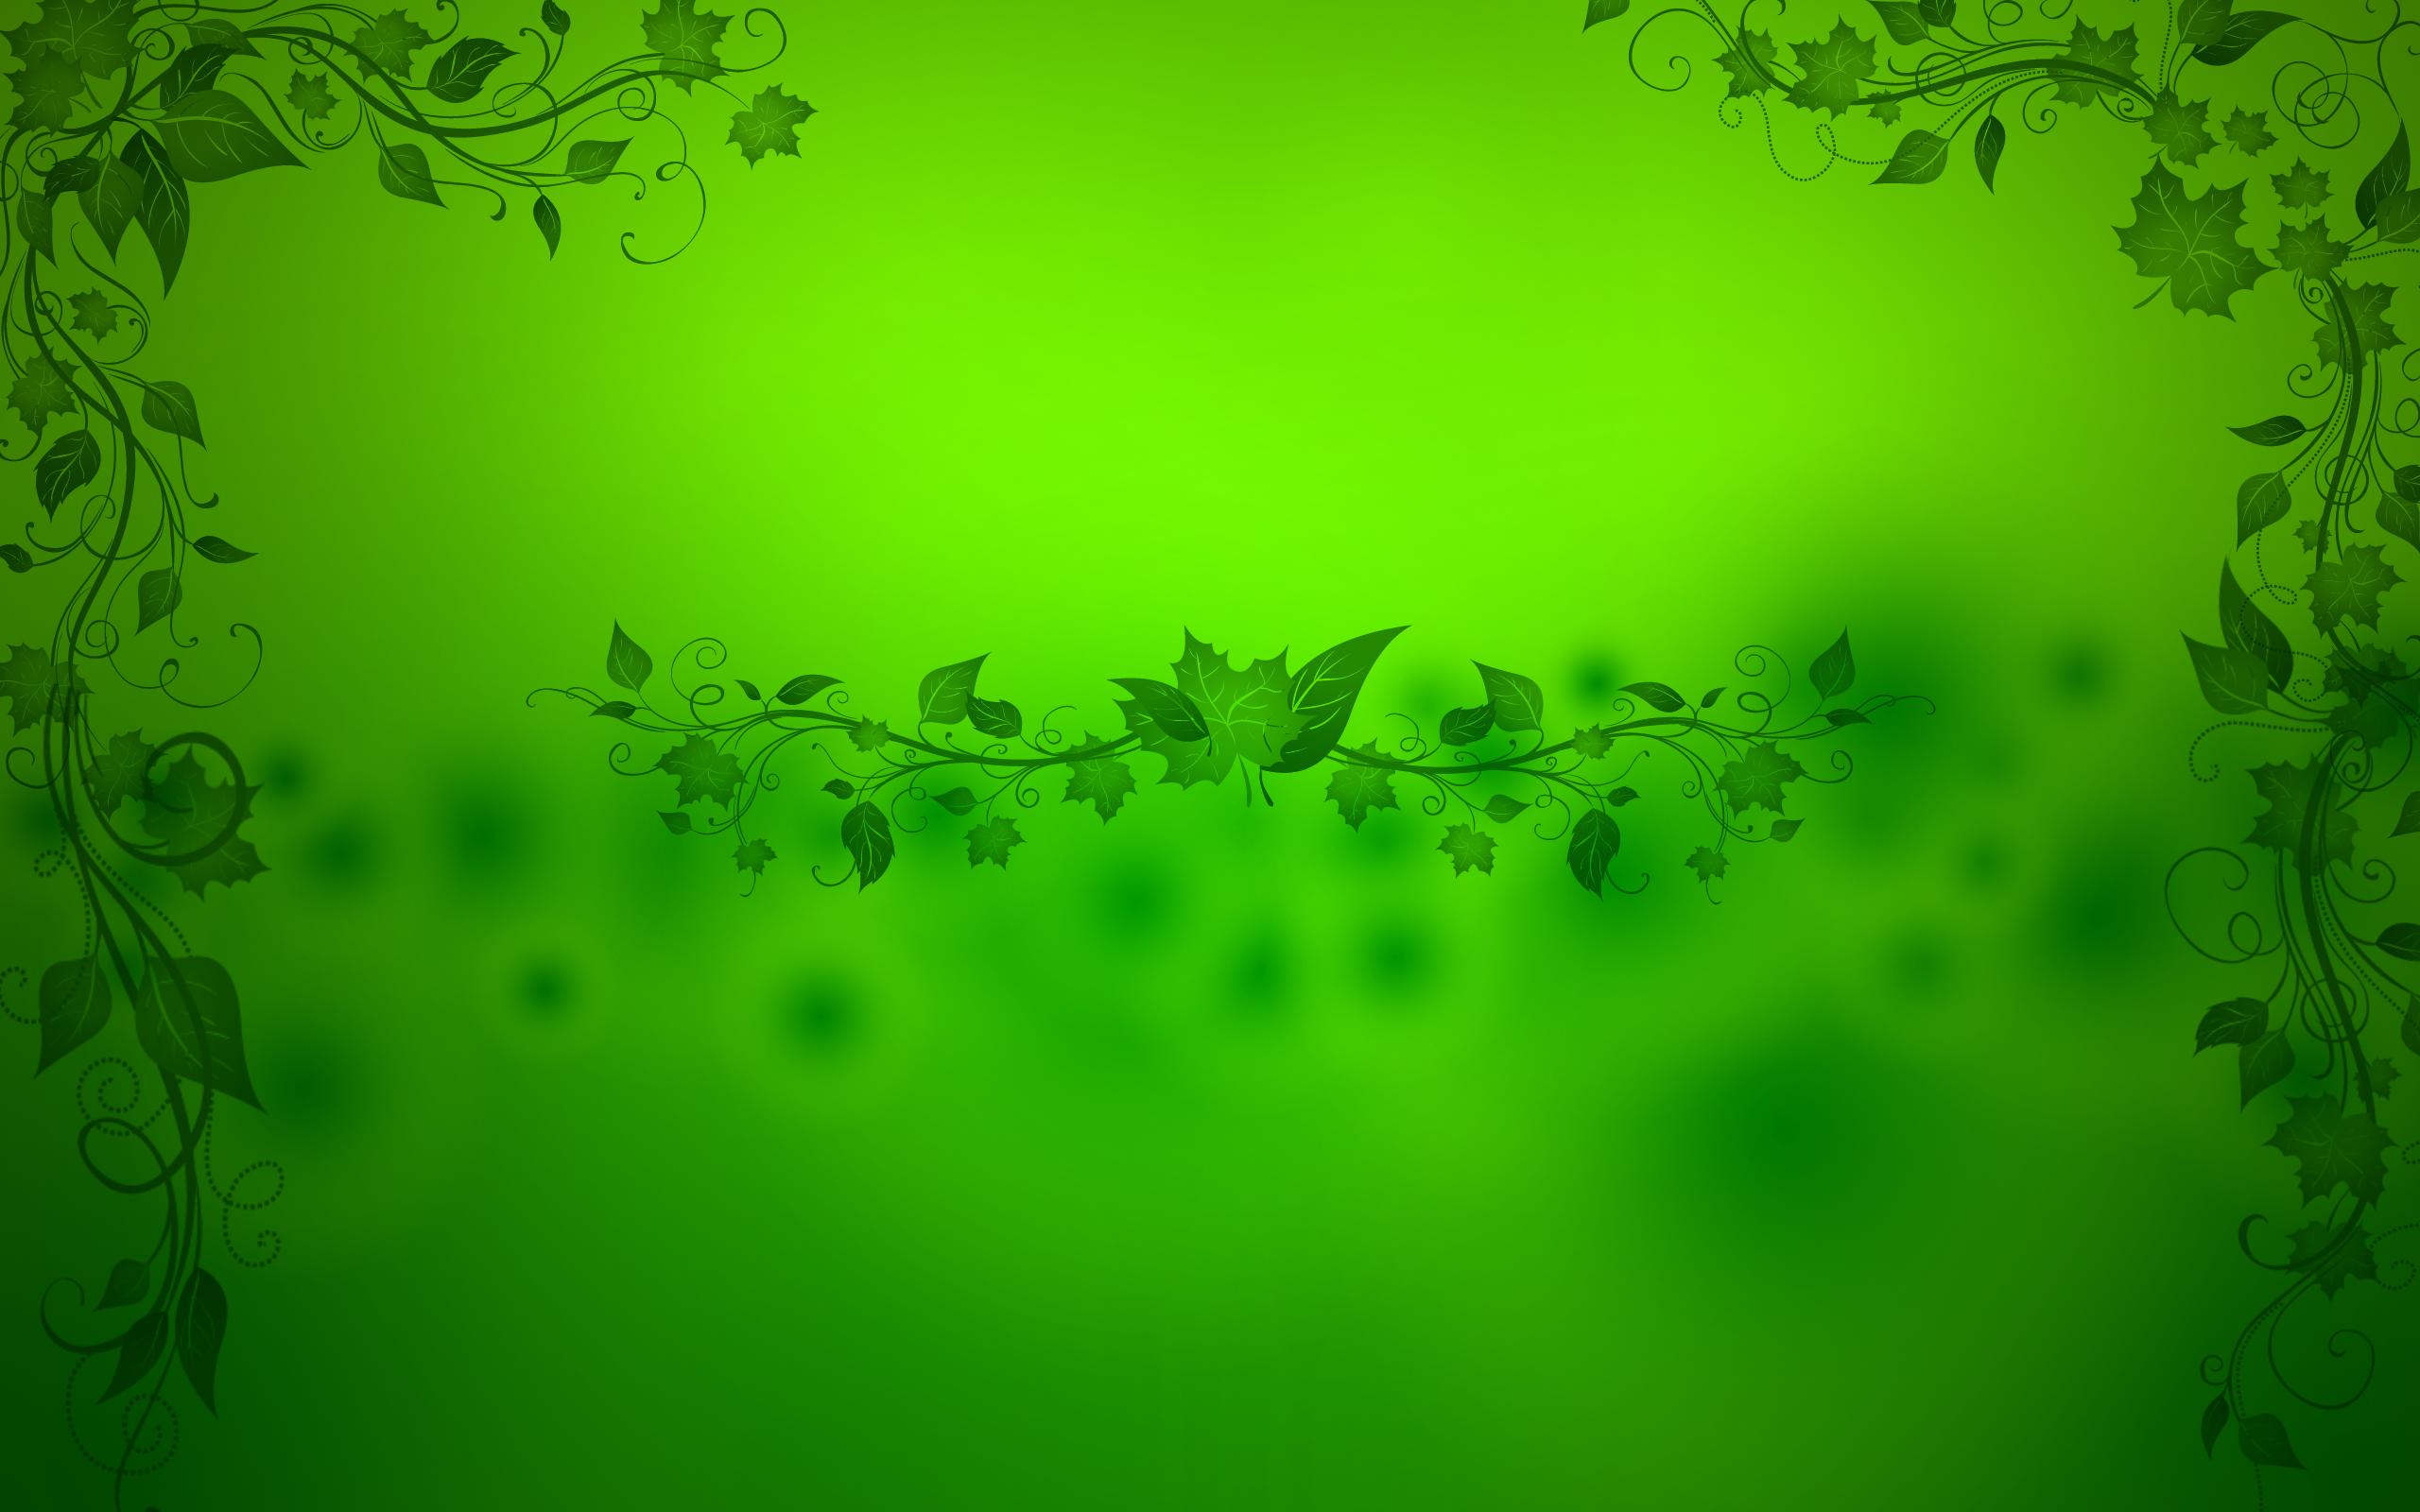 green background wallpaper backgrounds